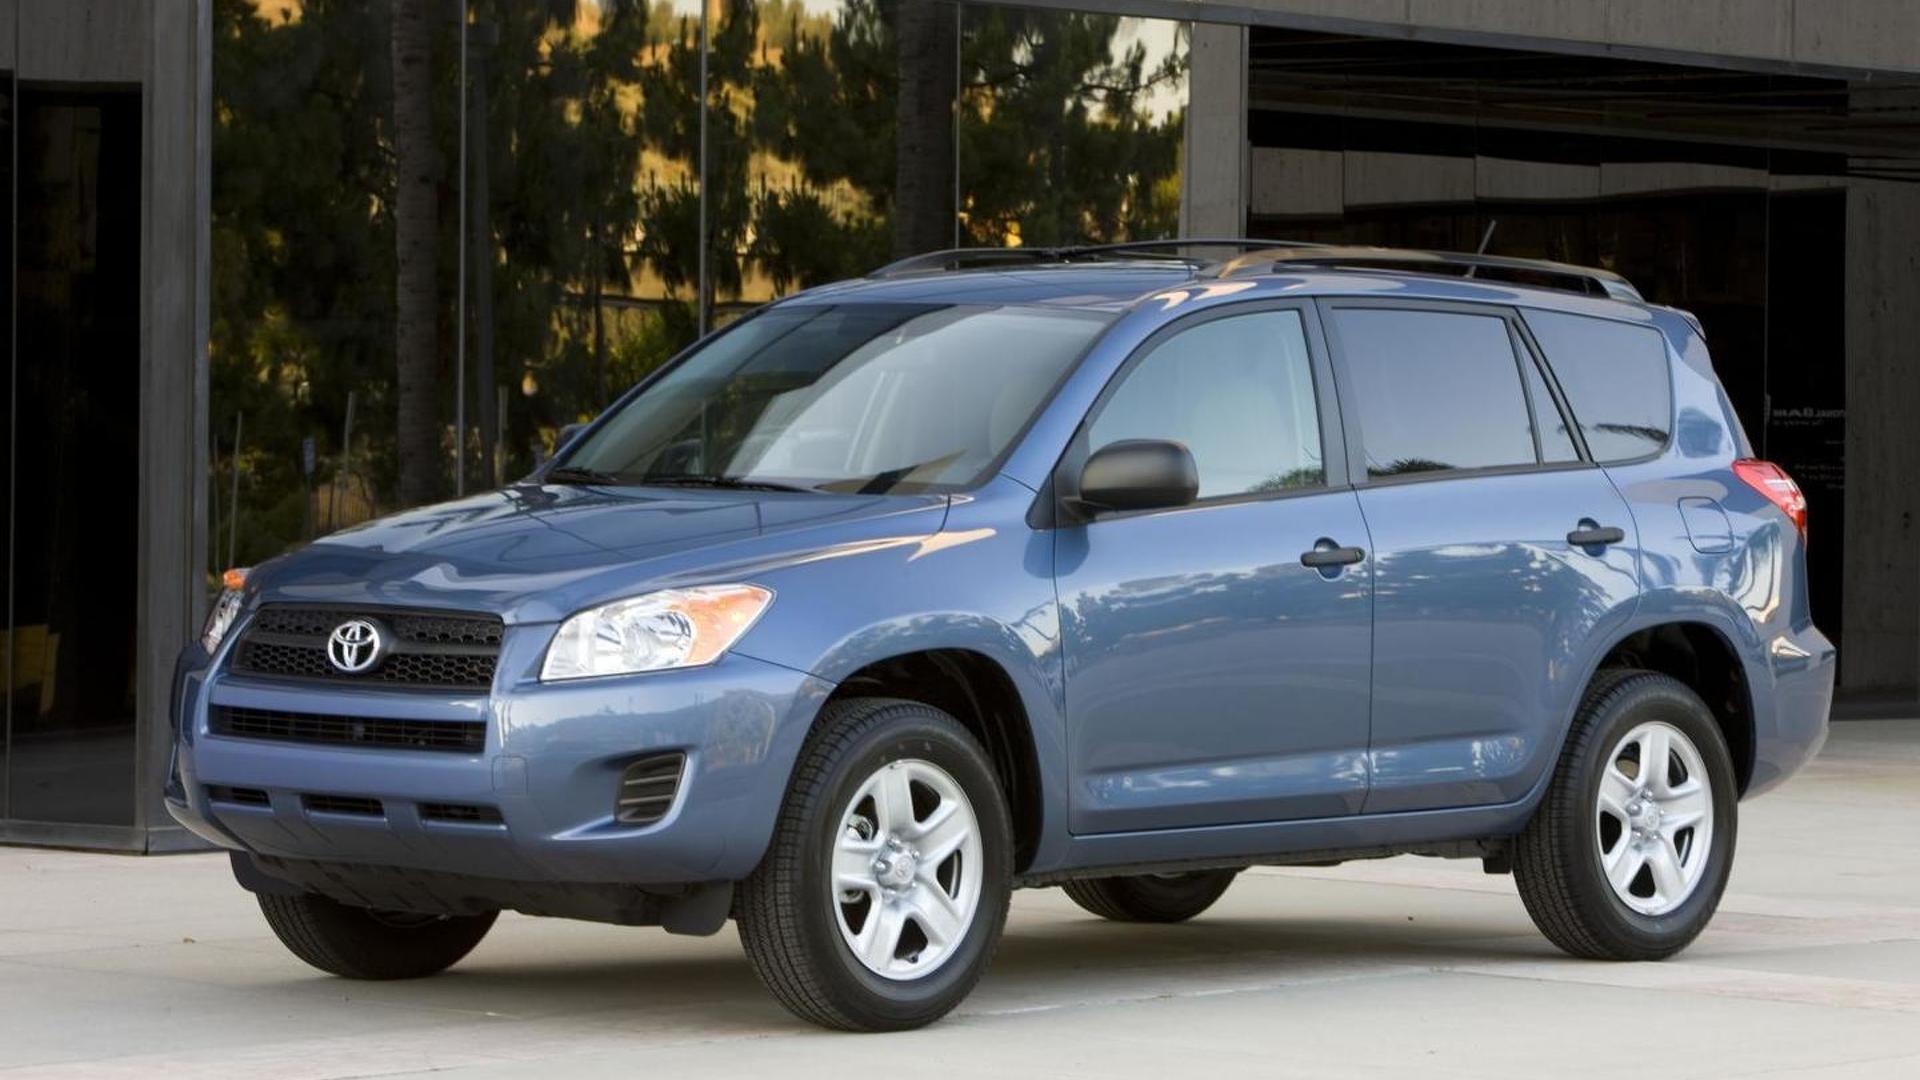 Toyota to introduce RAV4 EV at LA Auto Show